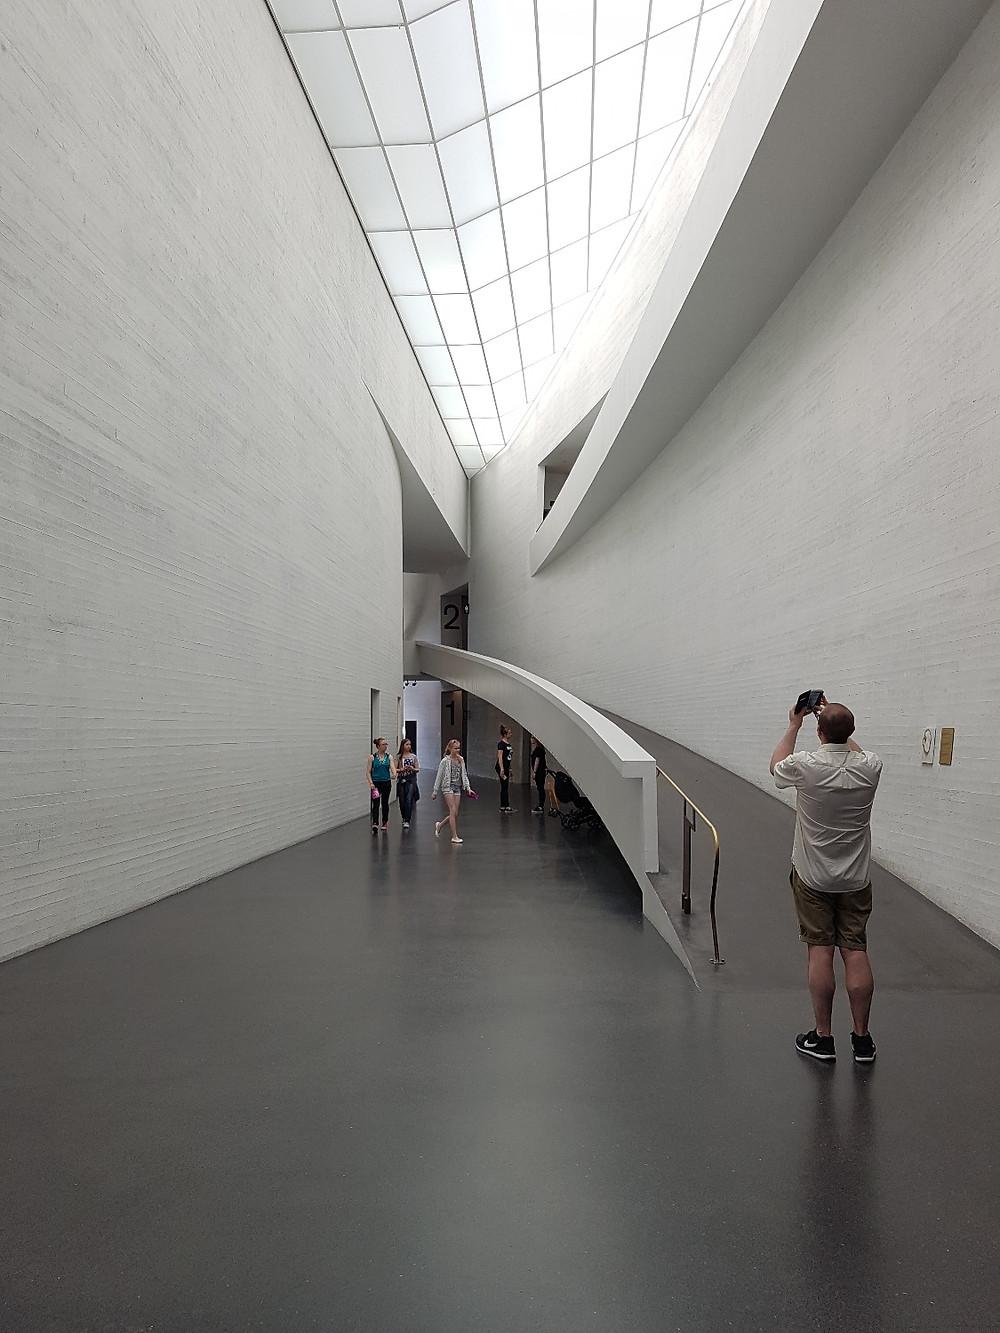 Kiasma Museum of Contemporary Art, Helsinki, Finland